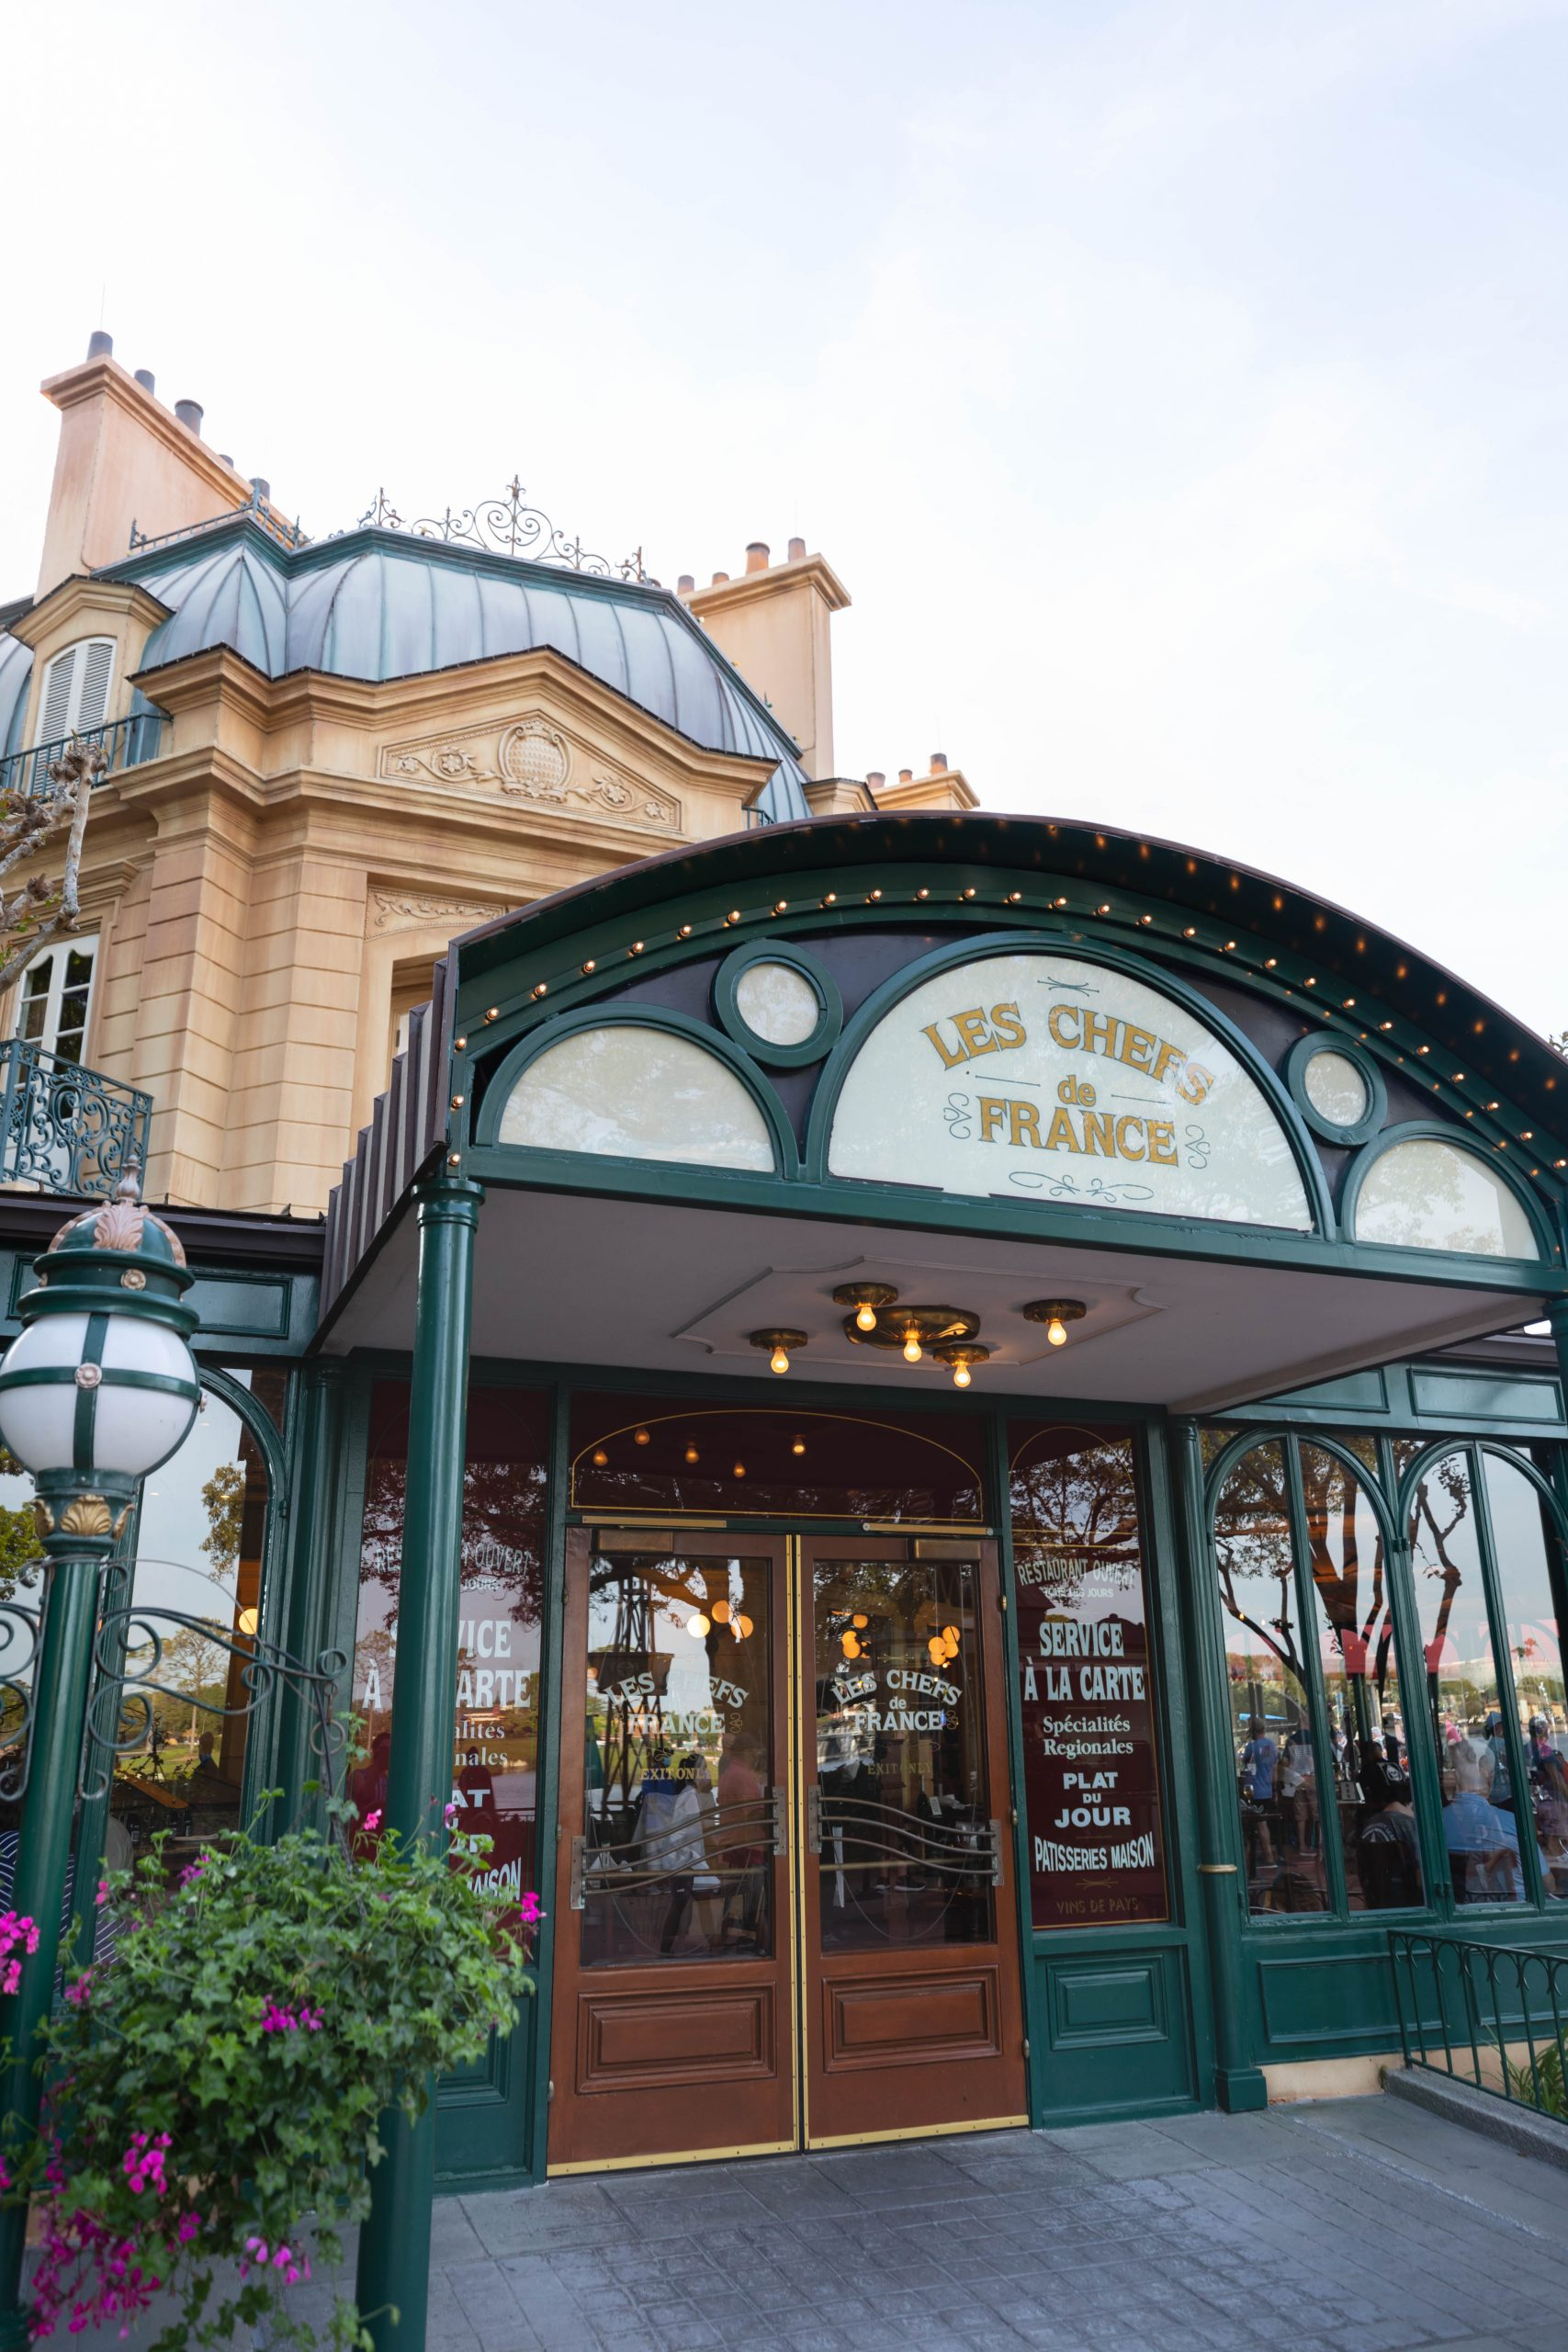 France French Gardens at Epcot Walt Disney World Orlando Florida by Luxury Travel Writer and Photographer Annie Fairfax